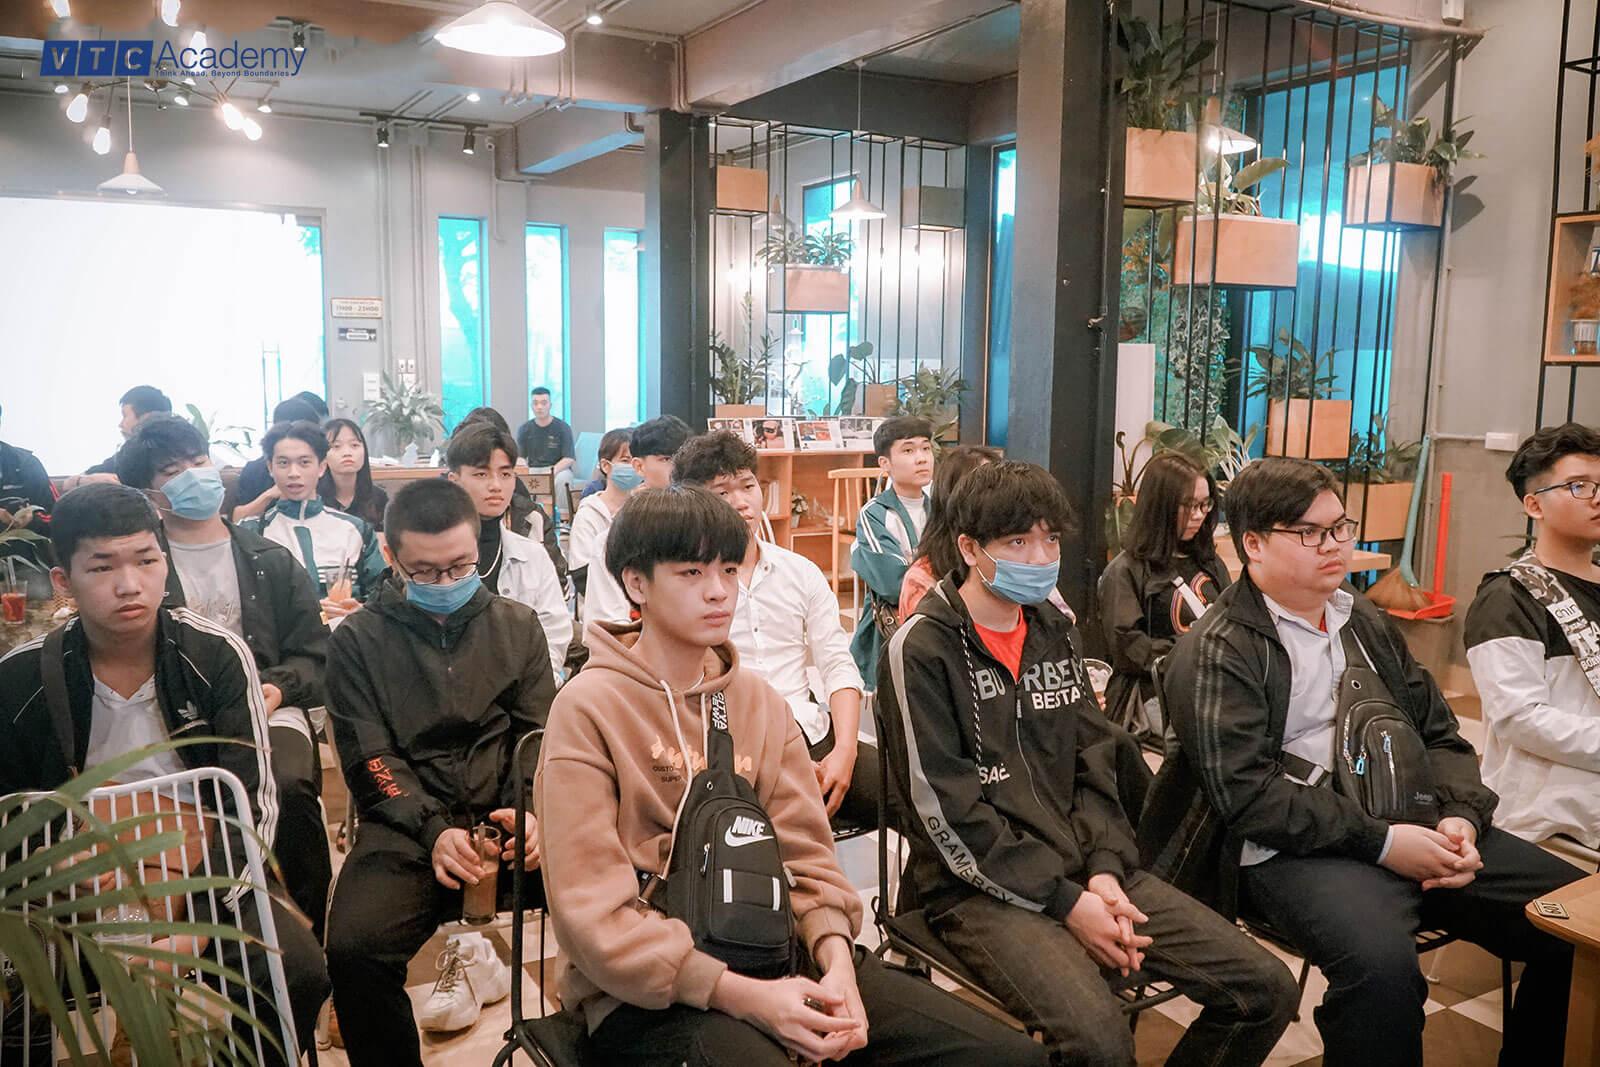 coffee-talk-phu-tho-vtc-academy-6